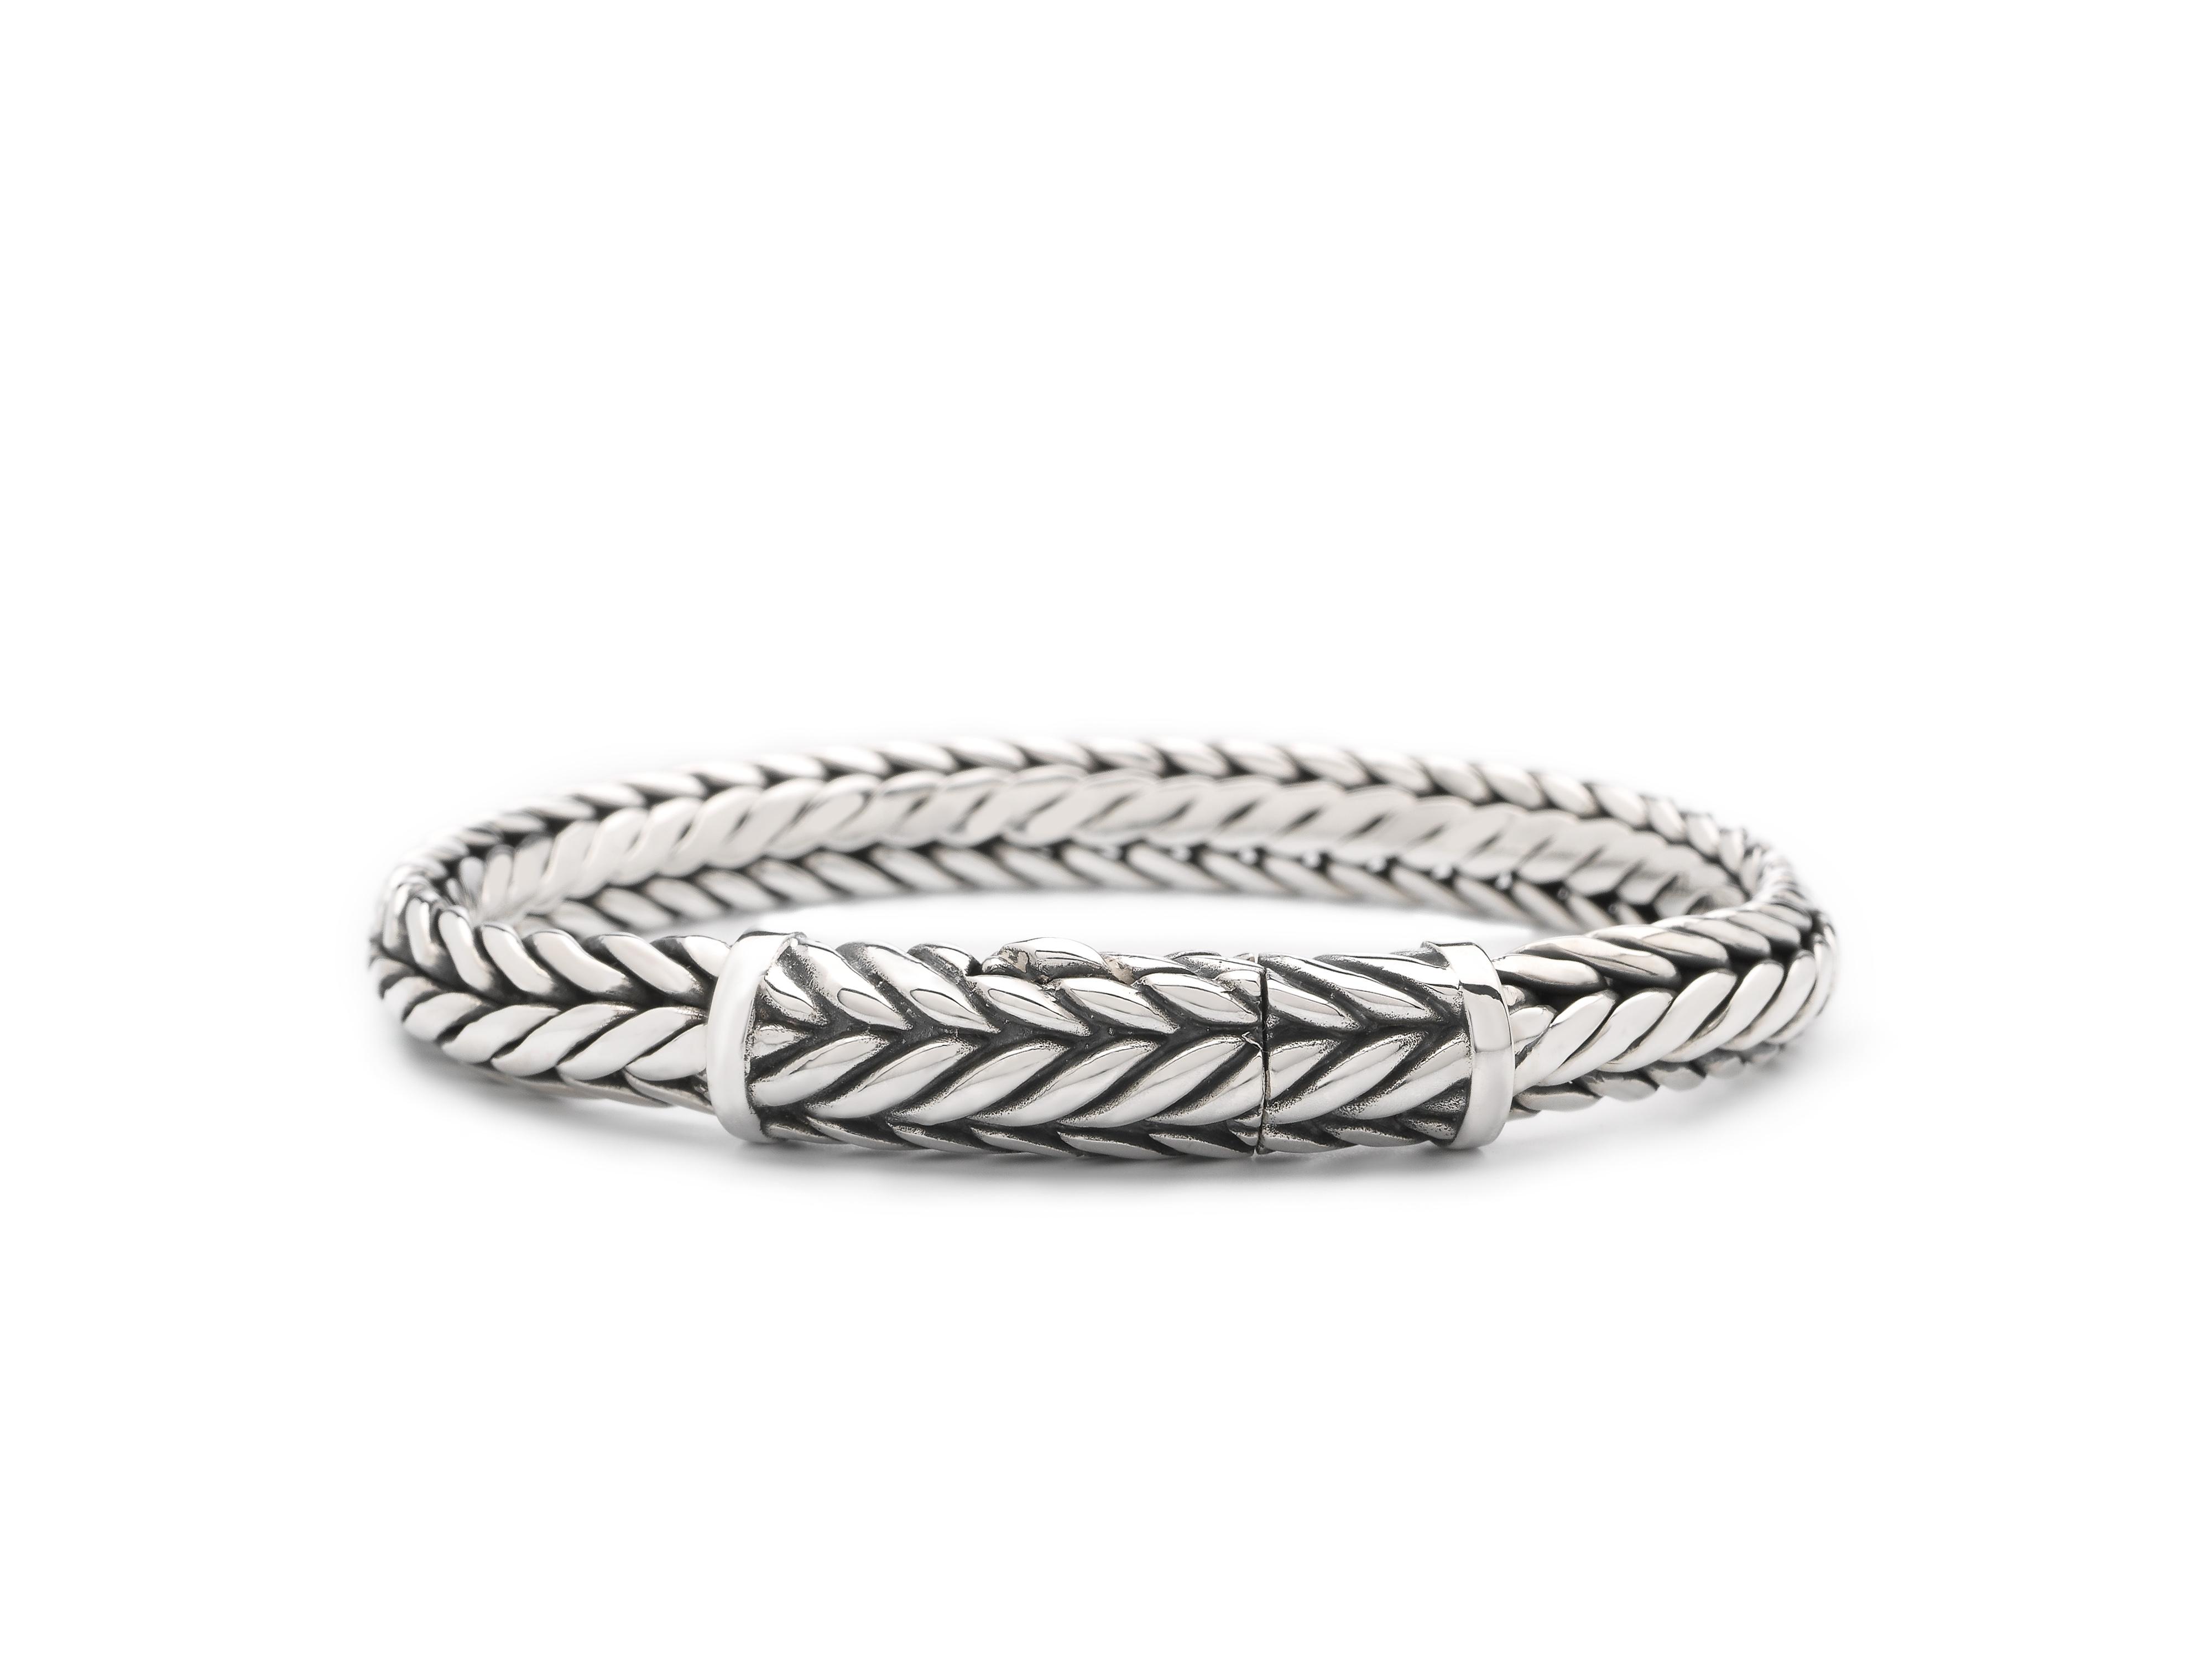 SILK Jewellery Armband zilver Eve 21cm 421